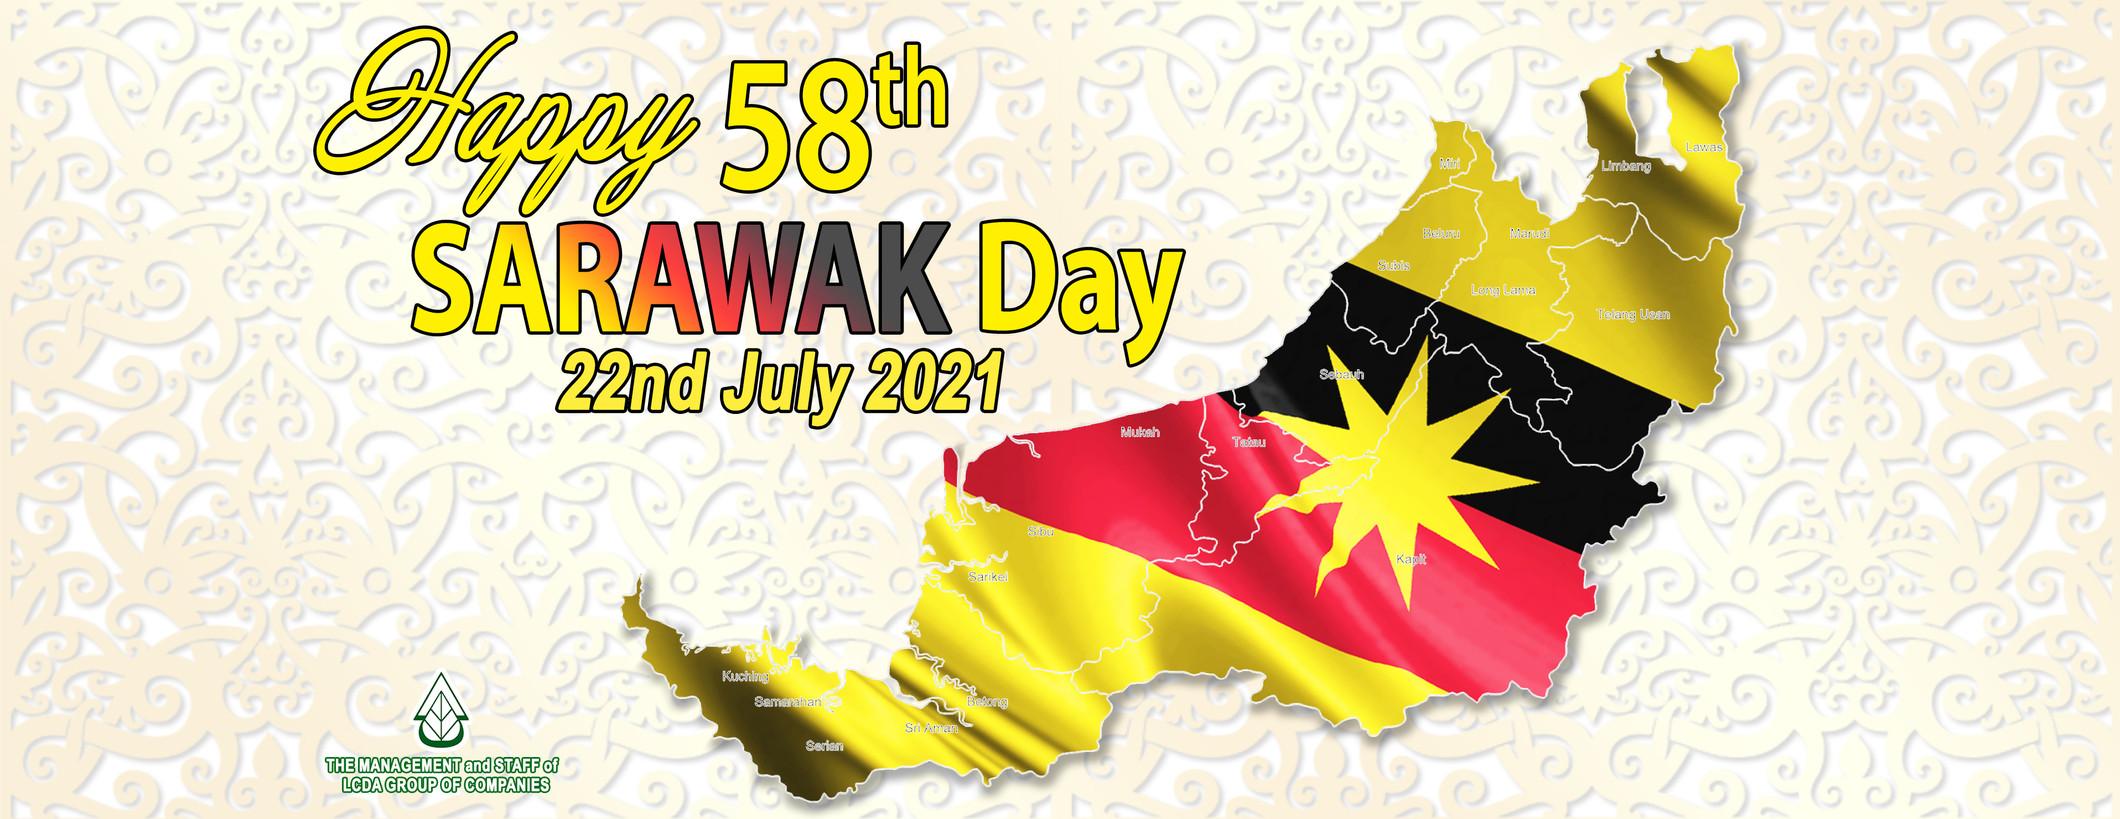 Ver 2 Website Sarawak Day 2021.jpg